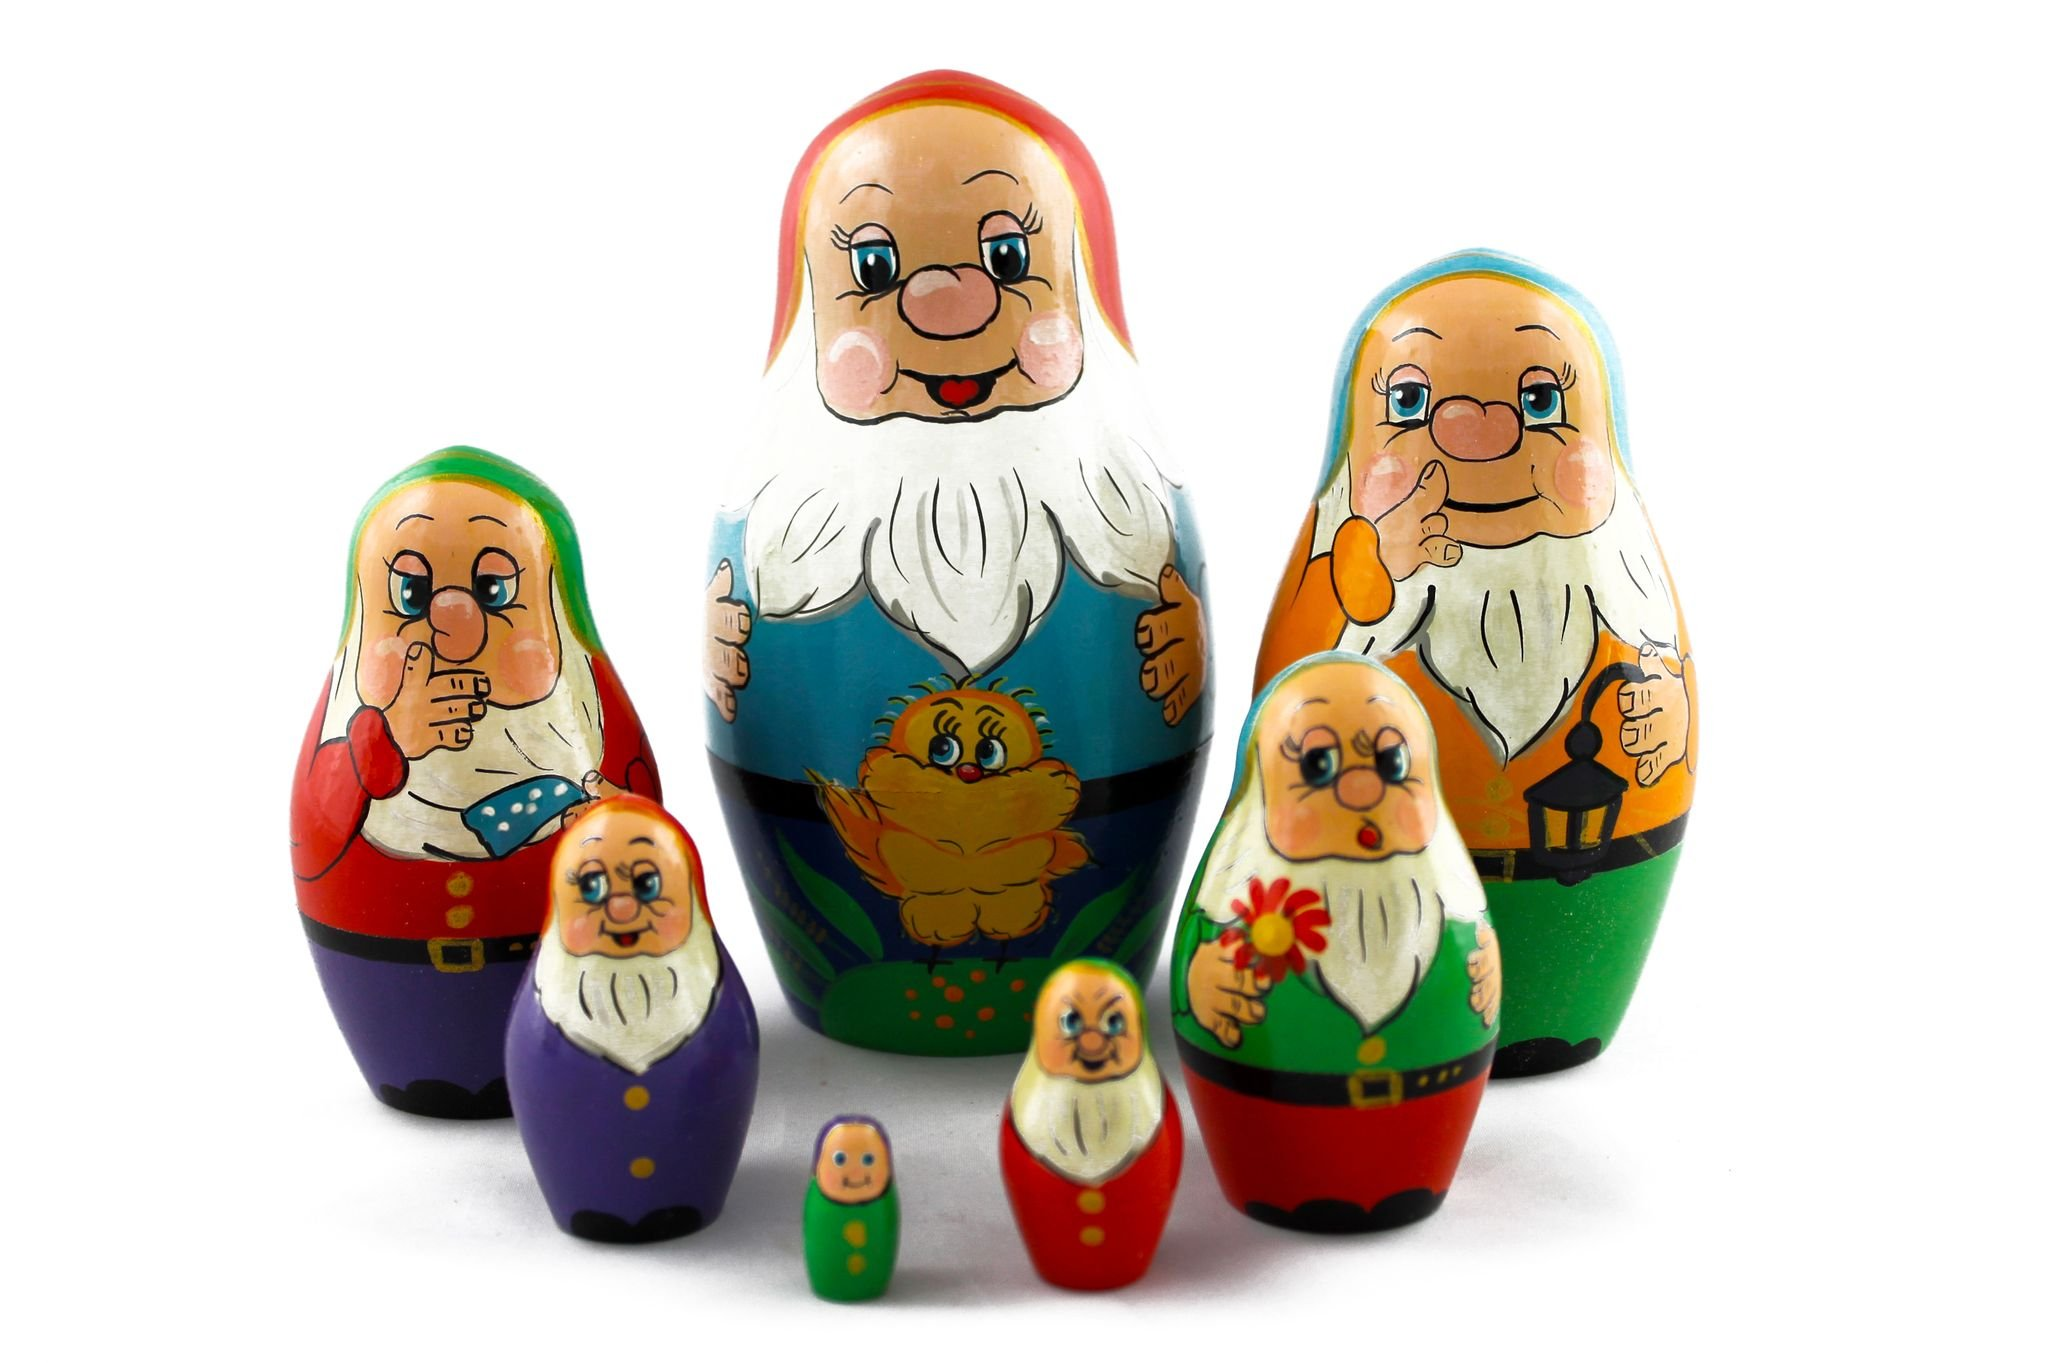 Matryoshka Russian Nesting Doll Babushka Beautiful Dwarf Seven Dwarfs Set 7 Pieces Pcs Hand Painted Handmade Souvenir Gift Handicraft by MATRYOSHKA&HANDICRAFT (Image #5)